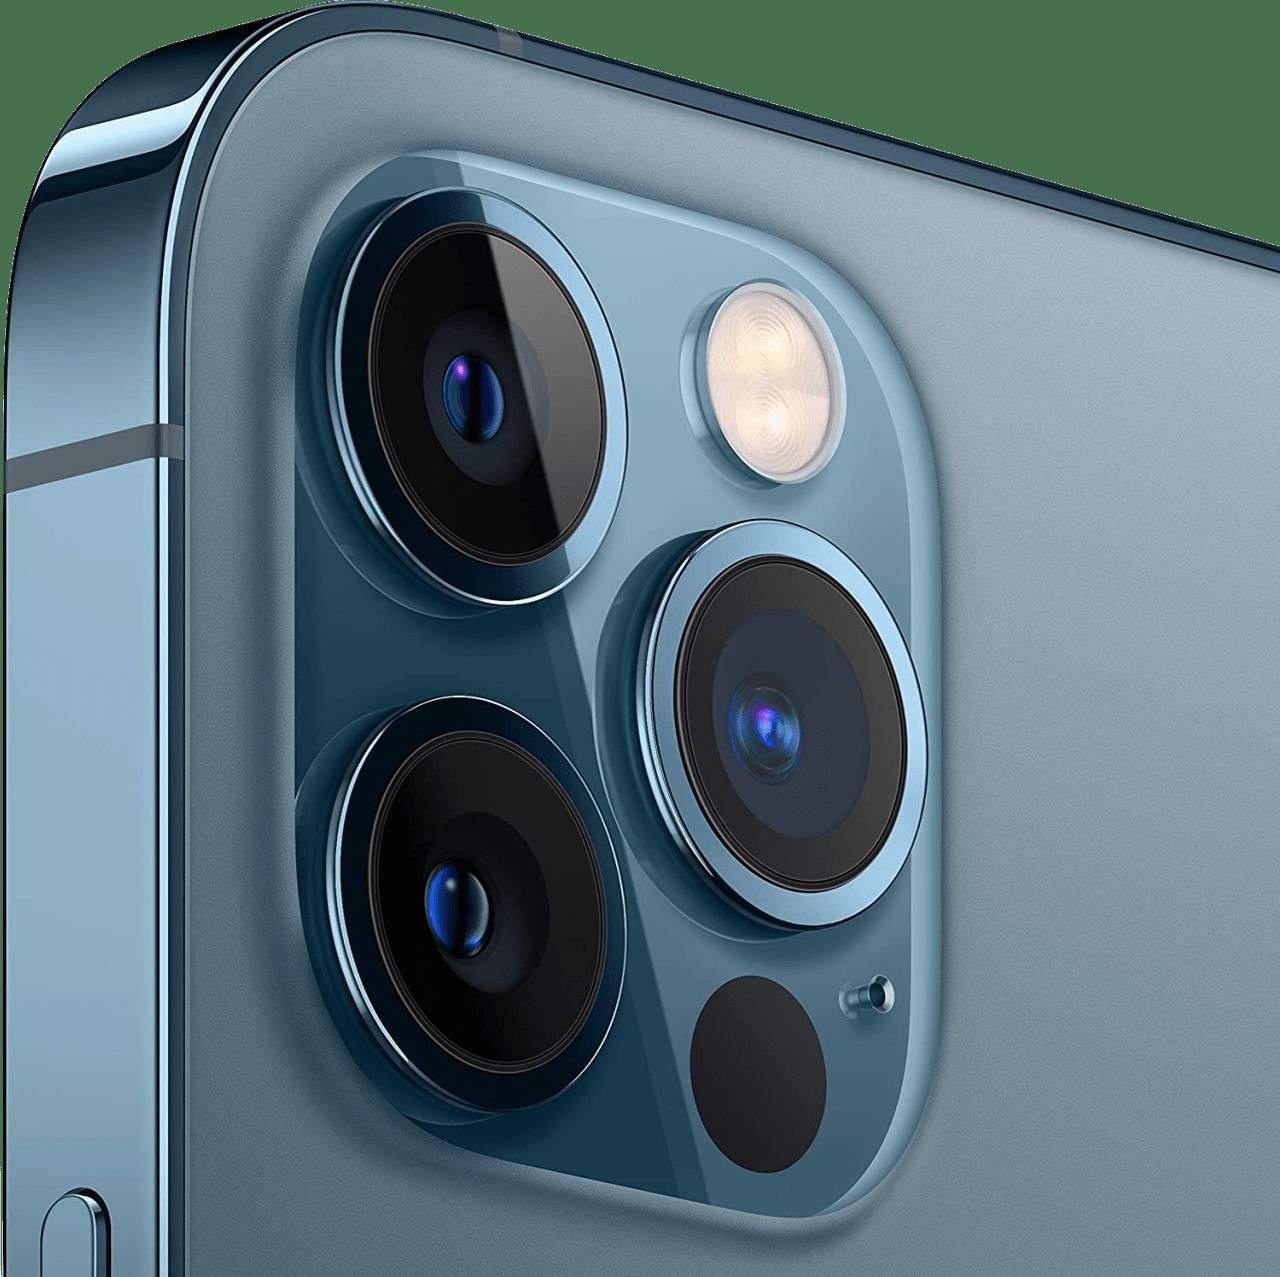 Pacific Blue Apple iPhone 12 Pro - 256GB - Dual Sim.4